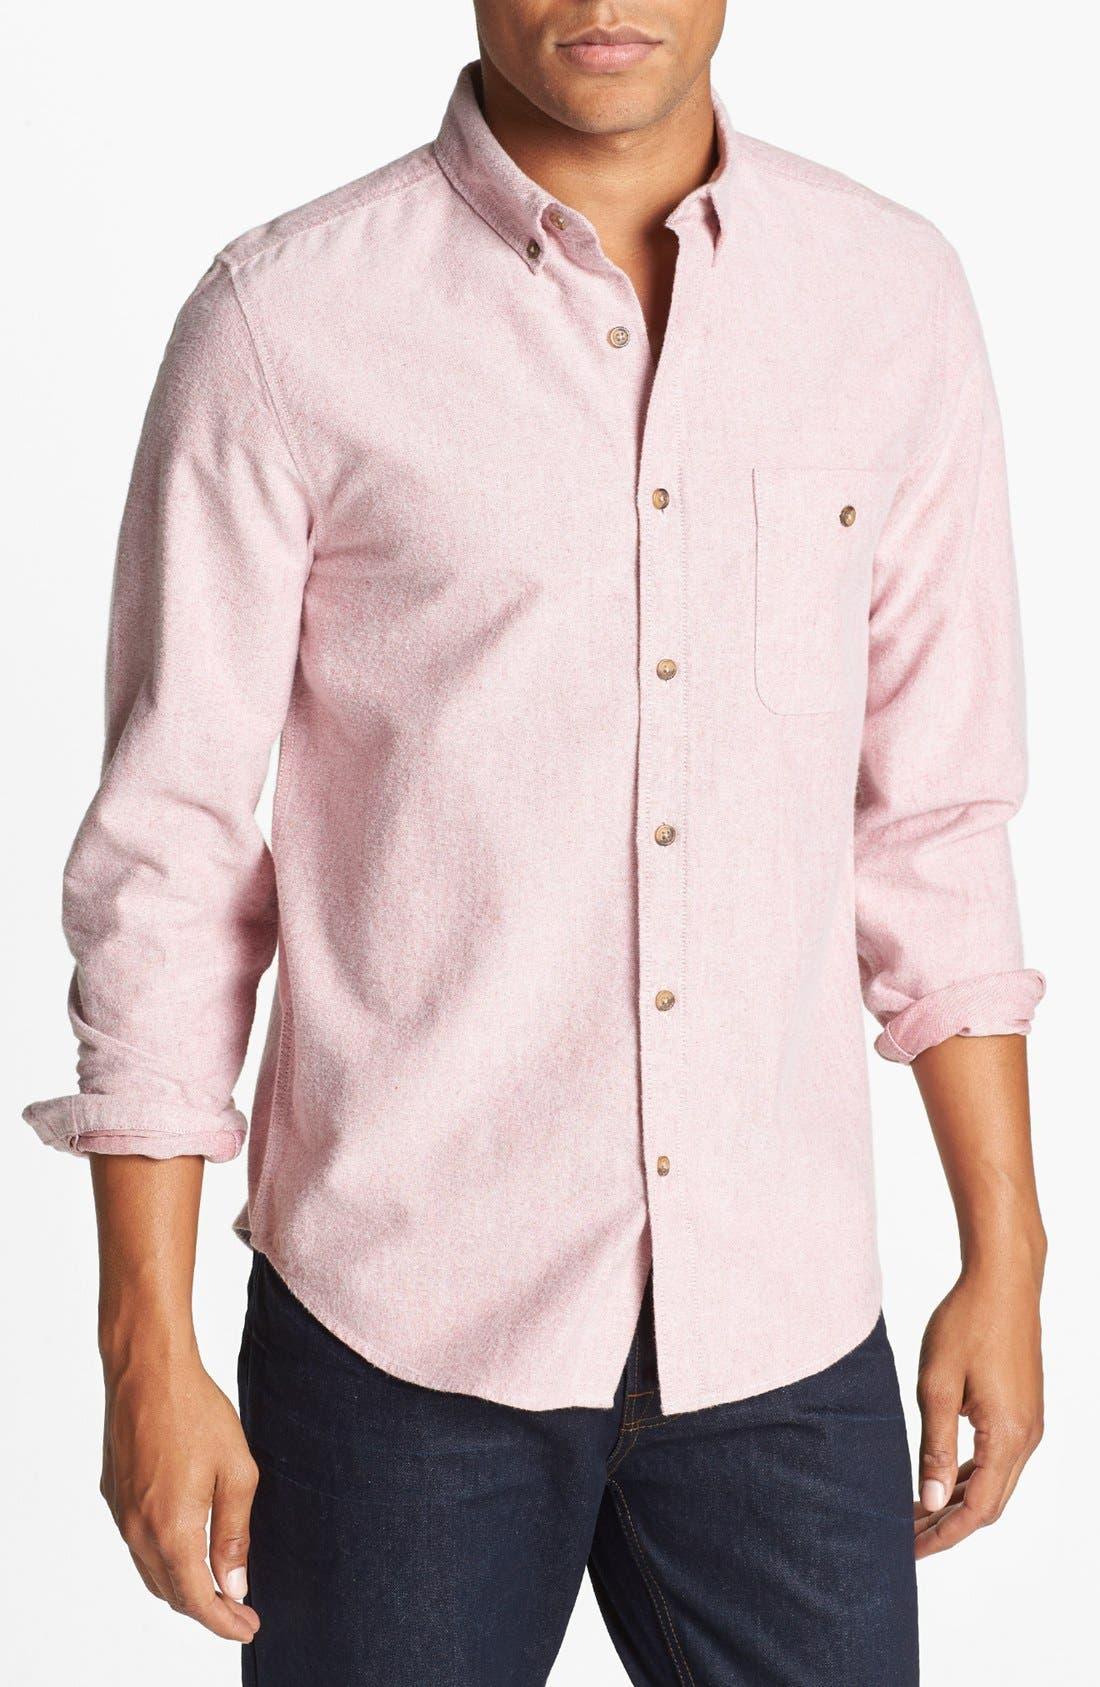 Alternate Image 1 Selected - Topman Oxford Cloth Shirt